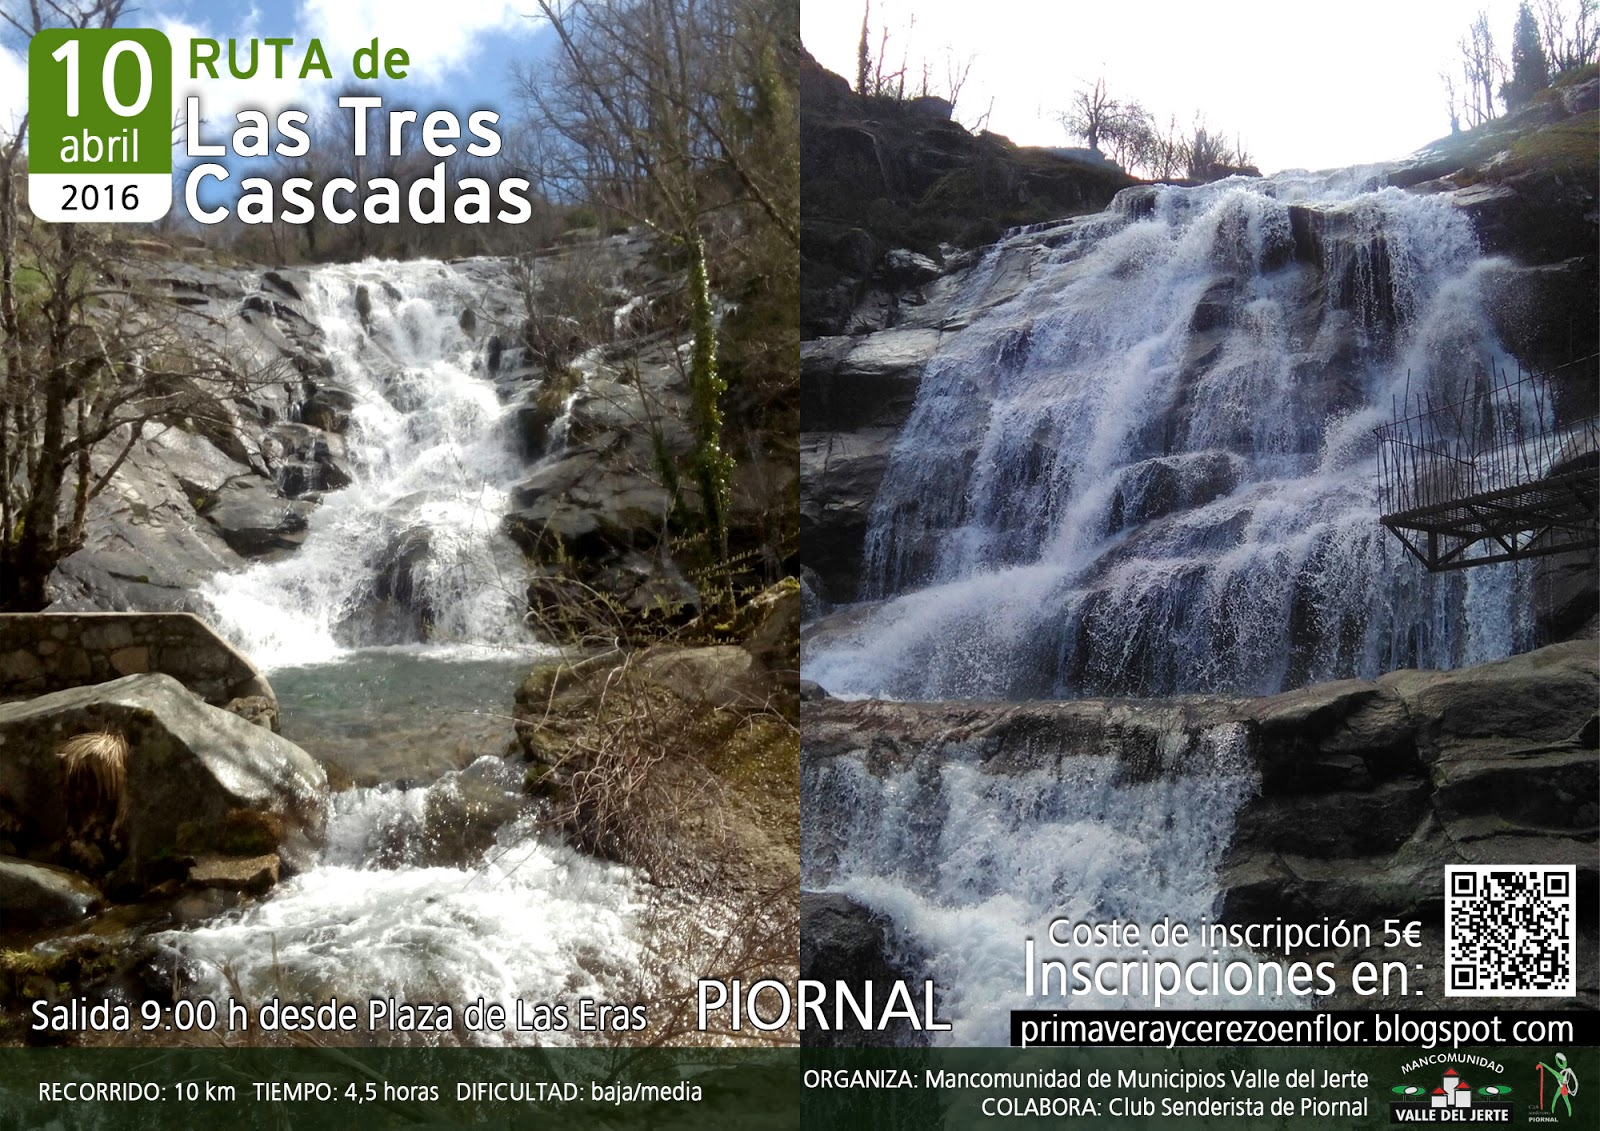 Ruta de las tres cascadas-Valle del Jerte 2016